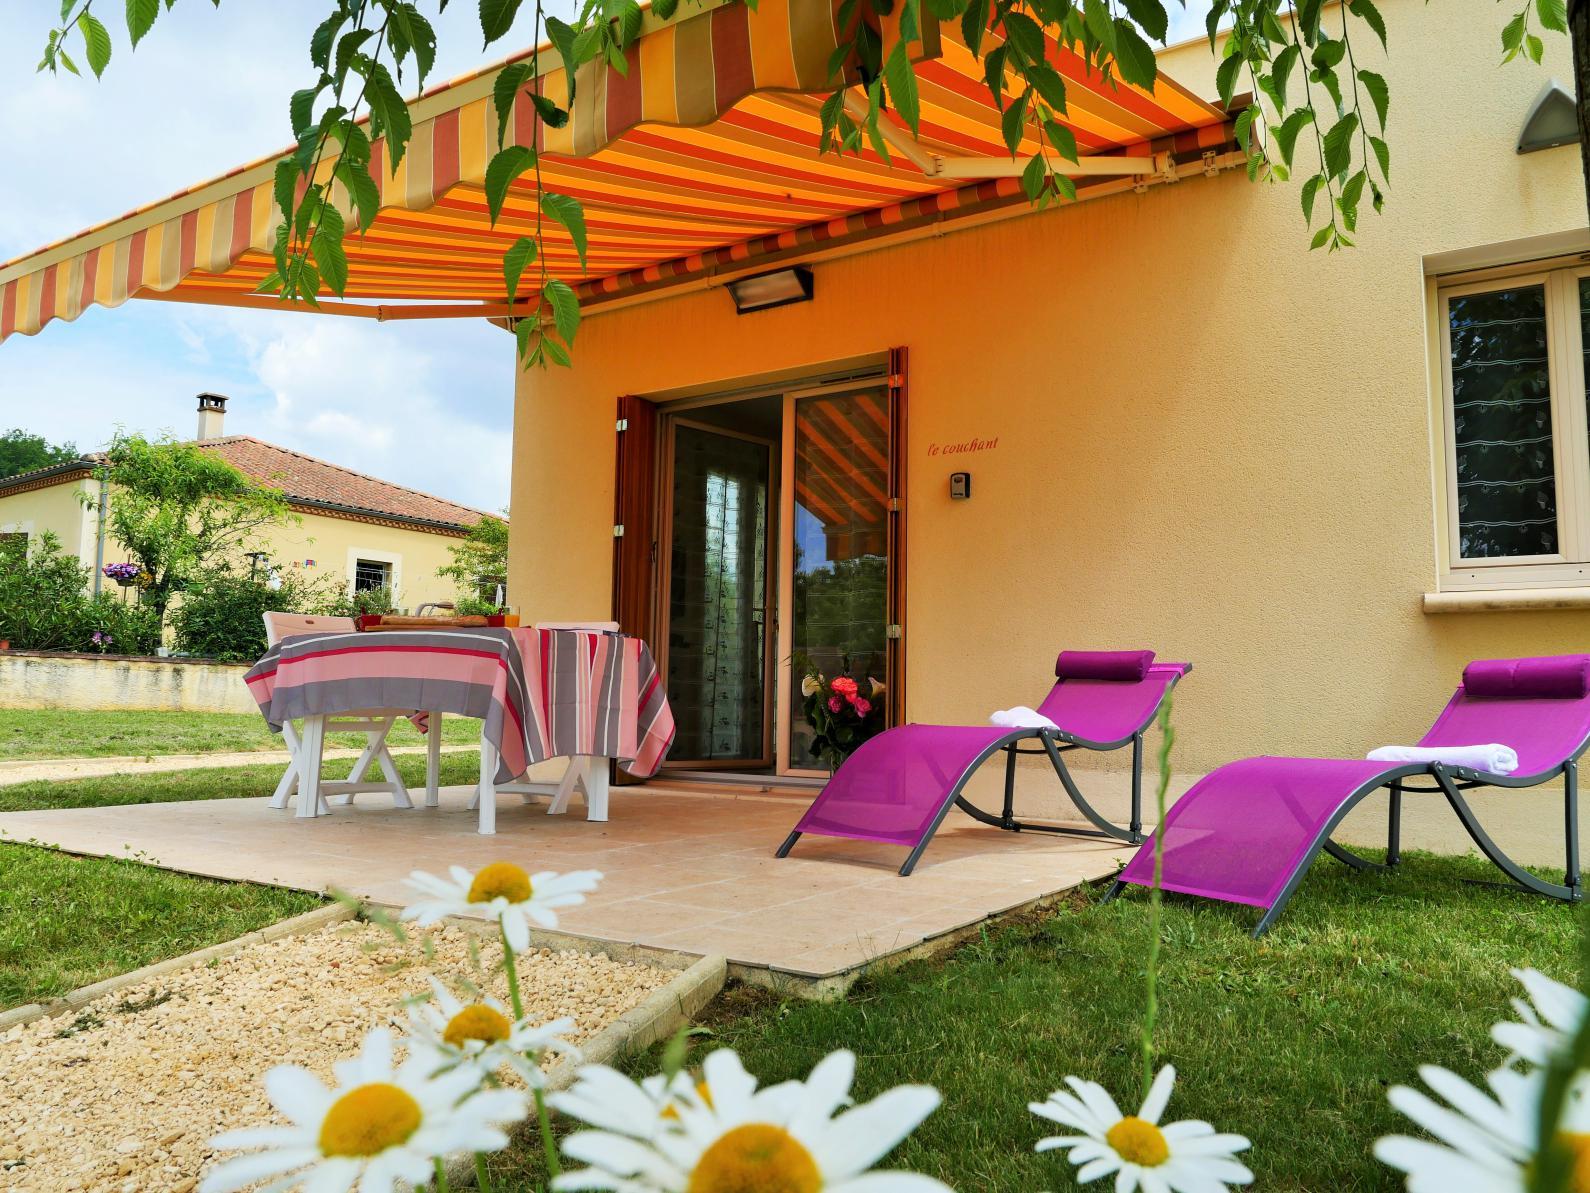 Dordogne locations gite pas cher sarlat 05 53 29 44 90 for Location gite pas cher